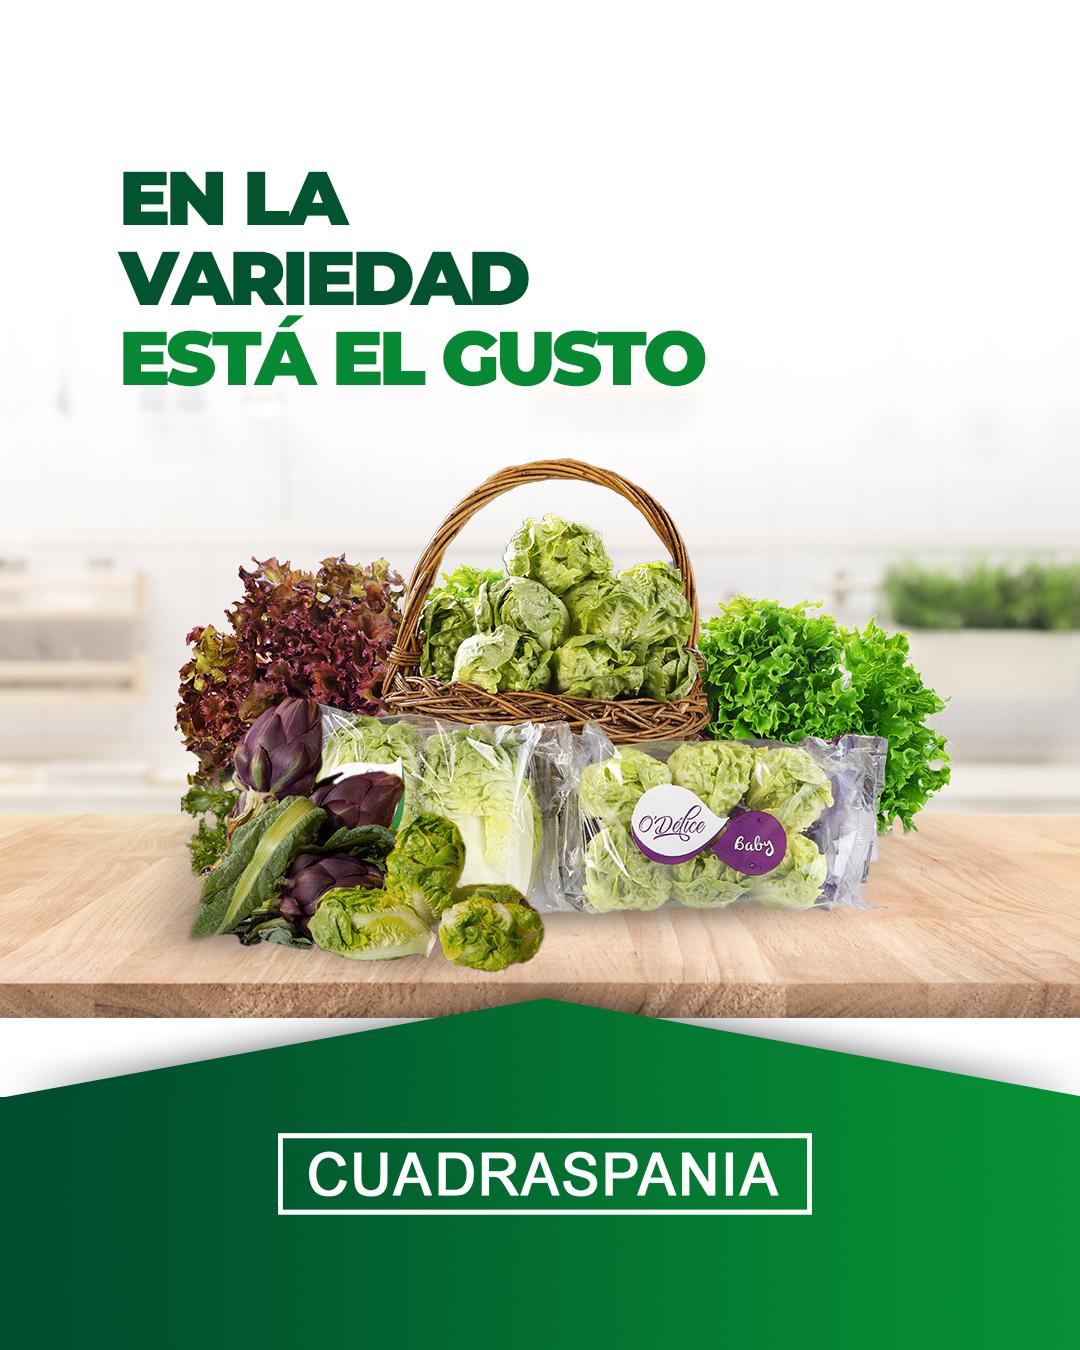 productos-cuadraspania